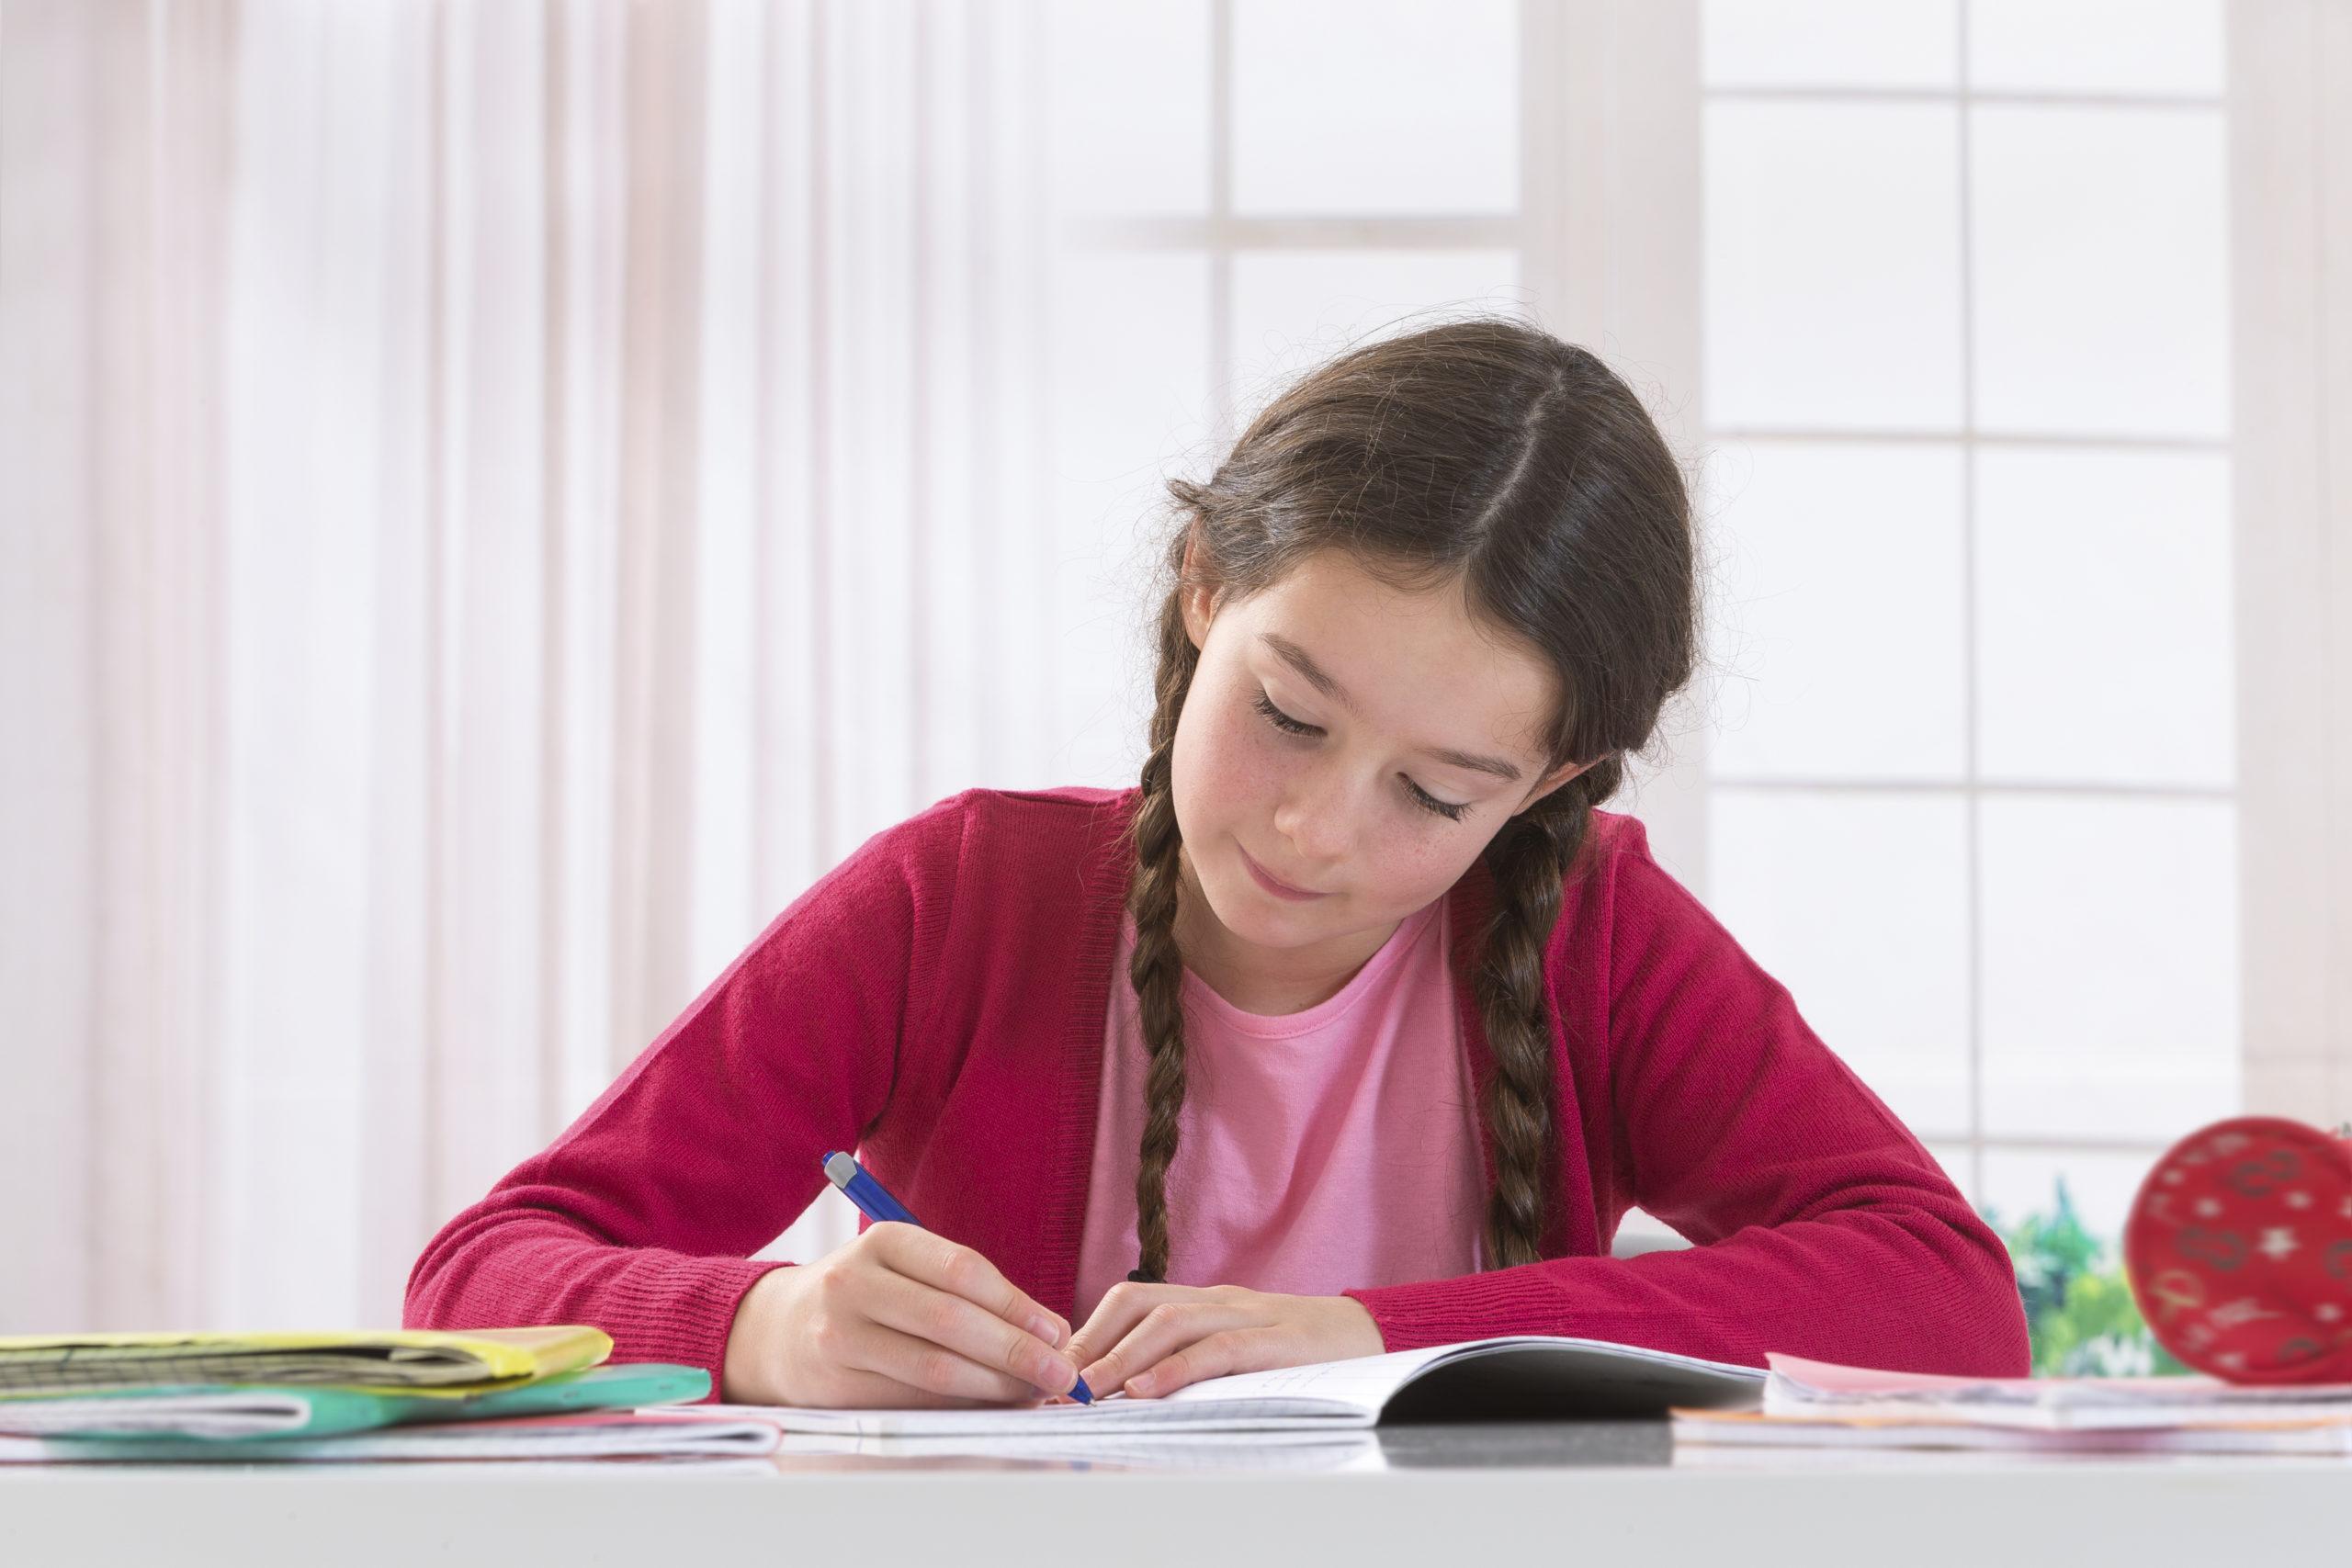 Autonomía para hacer deberes